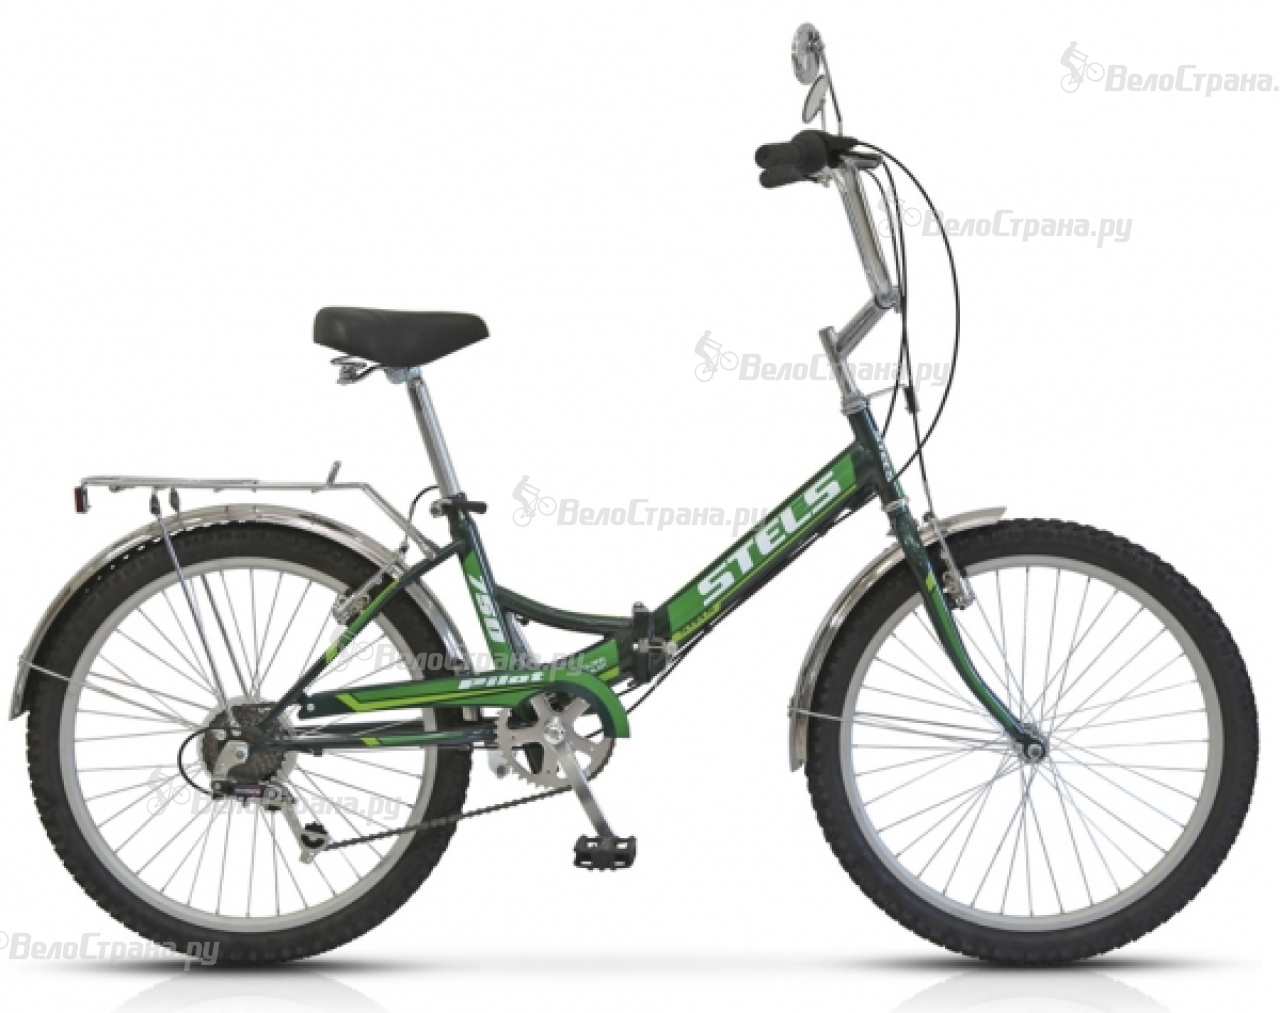 Велосипед Stels Pilot 750 (2013) велосипед stels navigator 310 2016